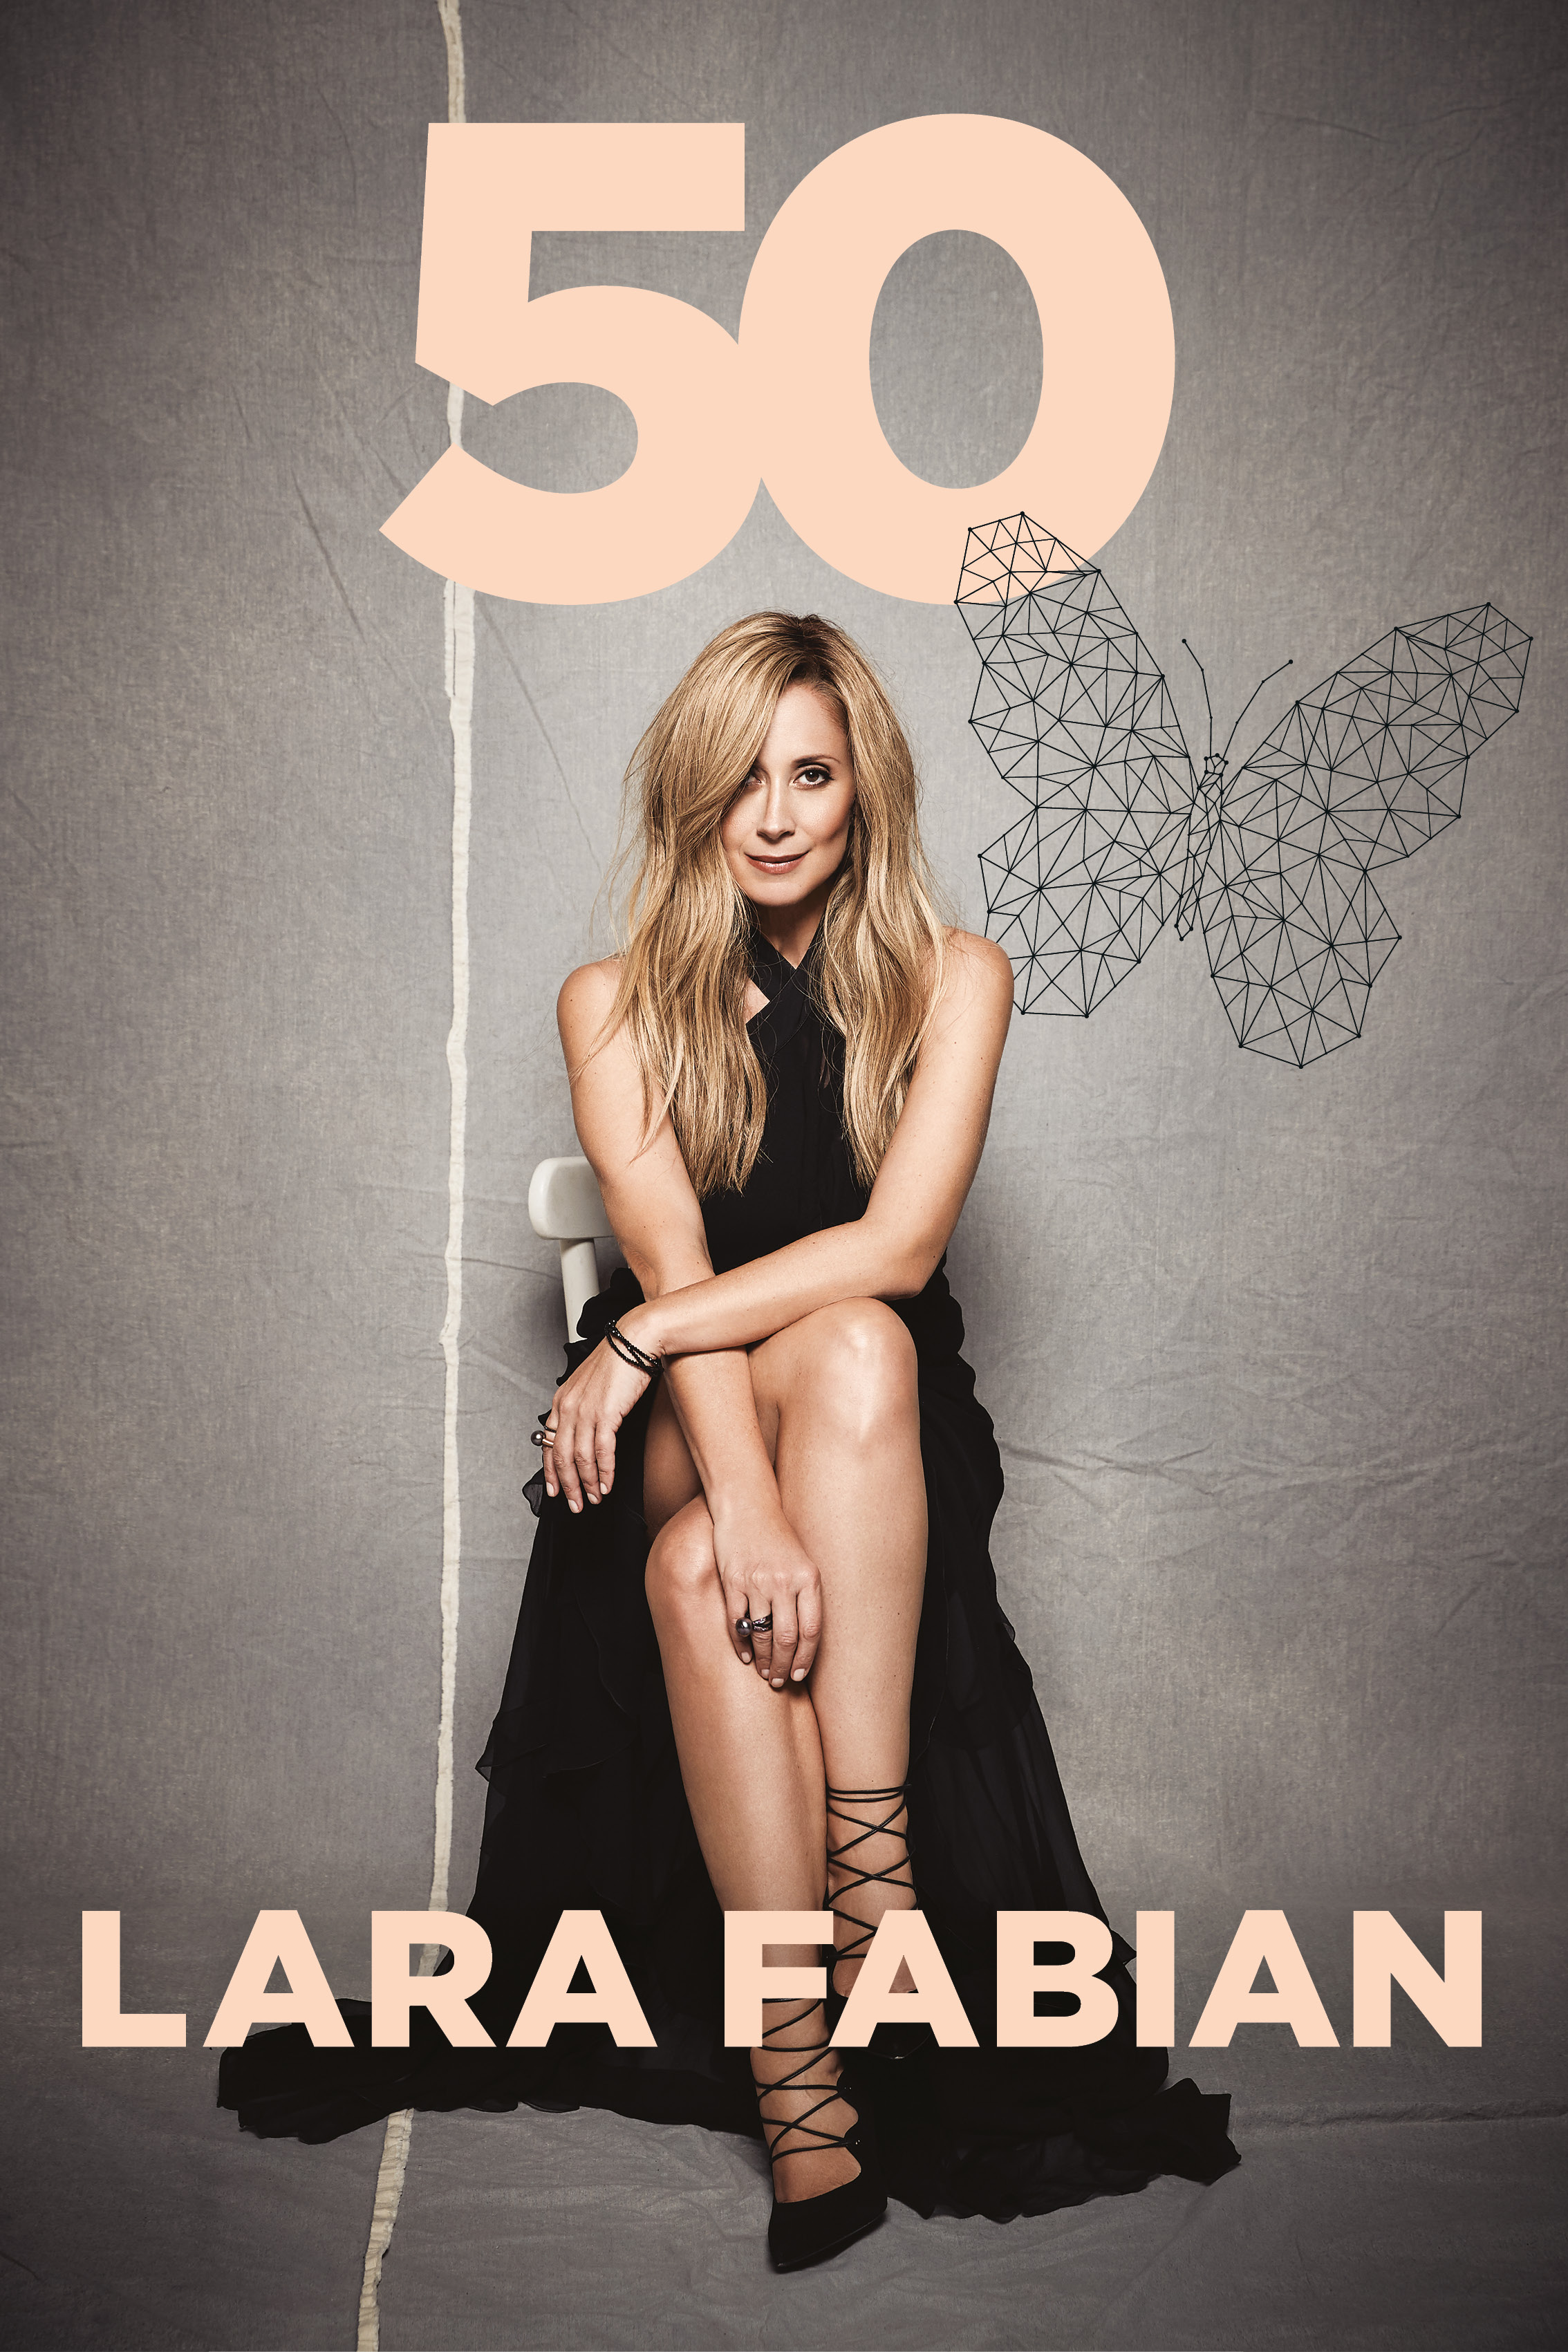 larafabian_2020_vignette_40x60_web.jpg